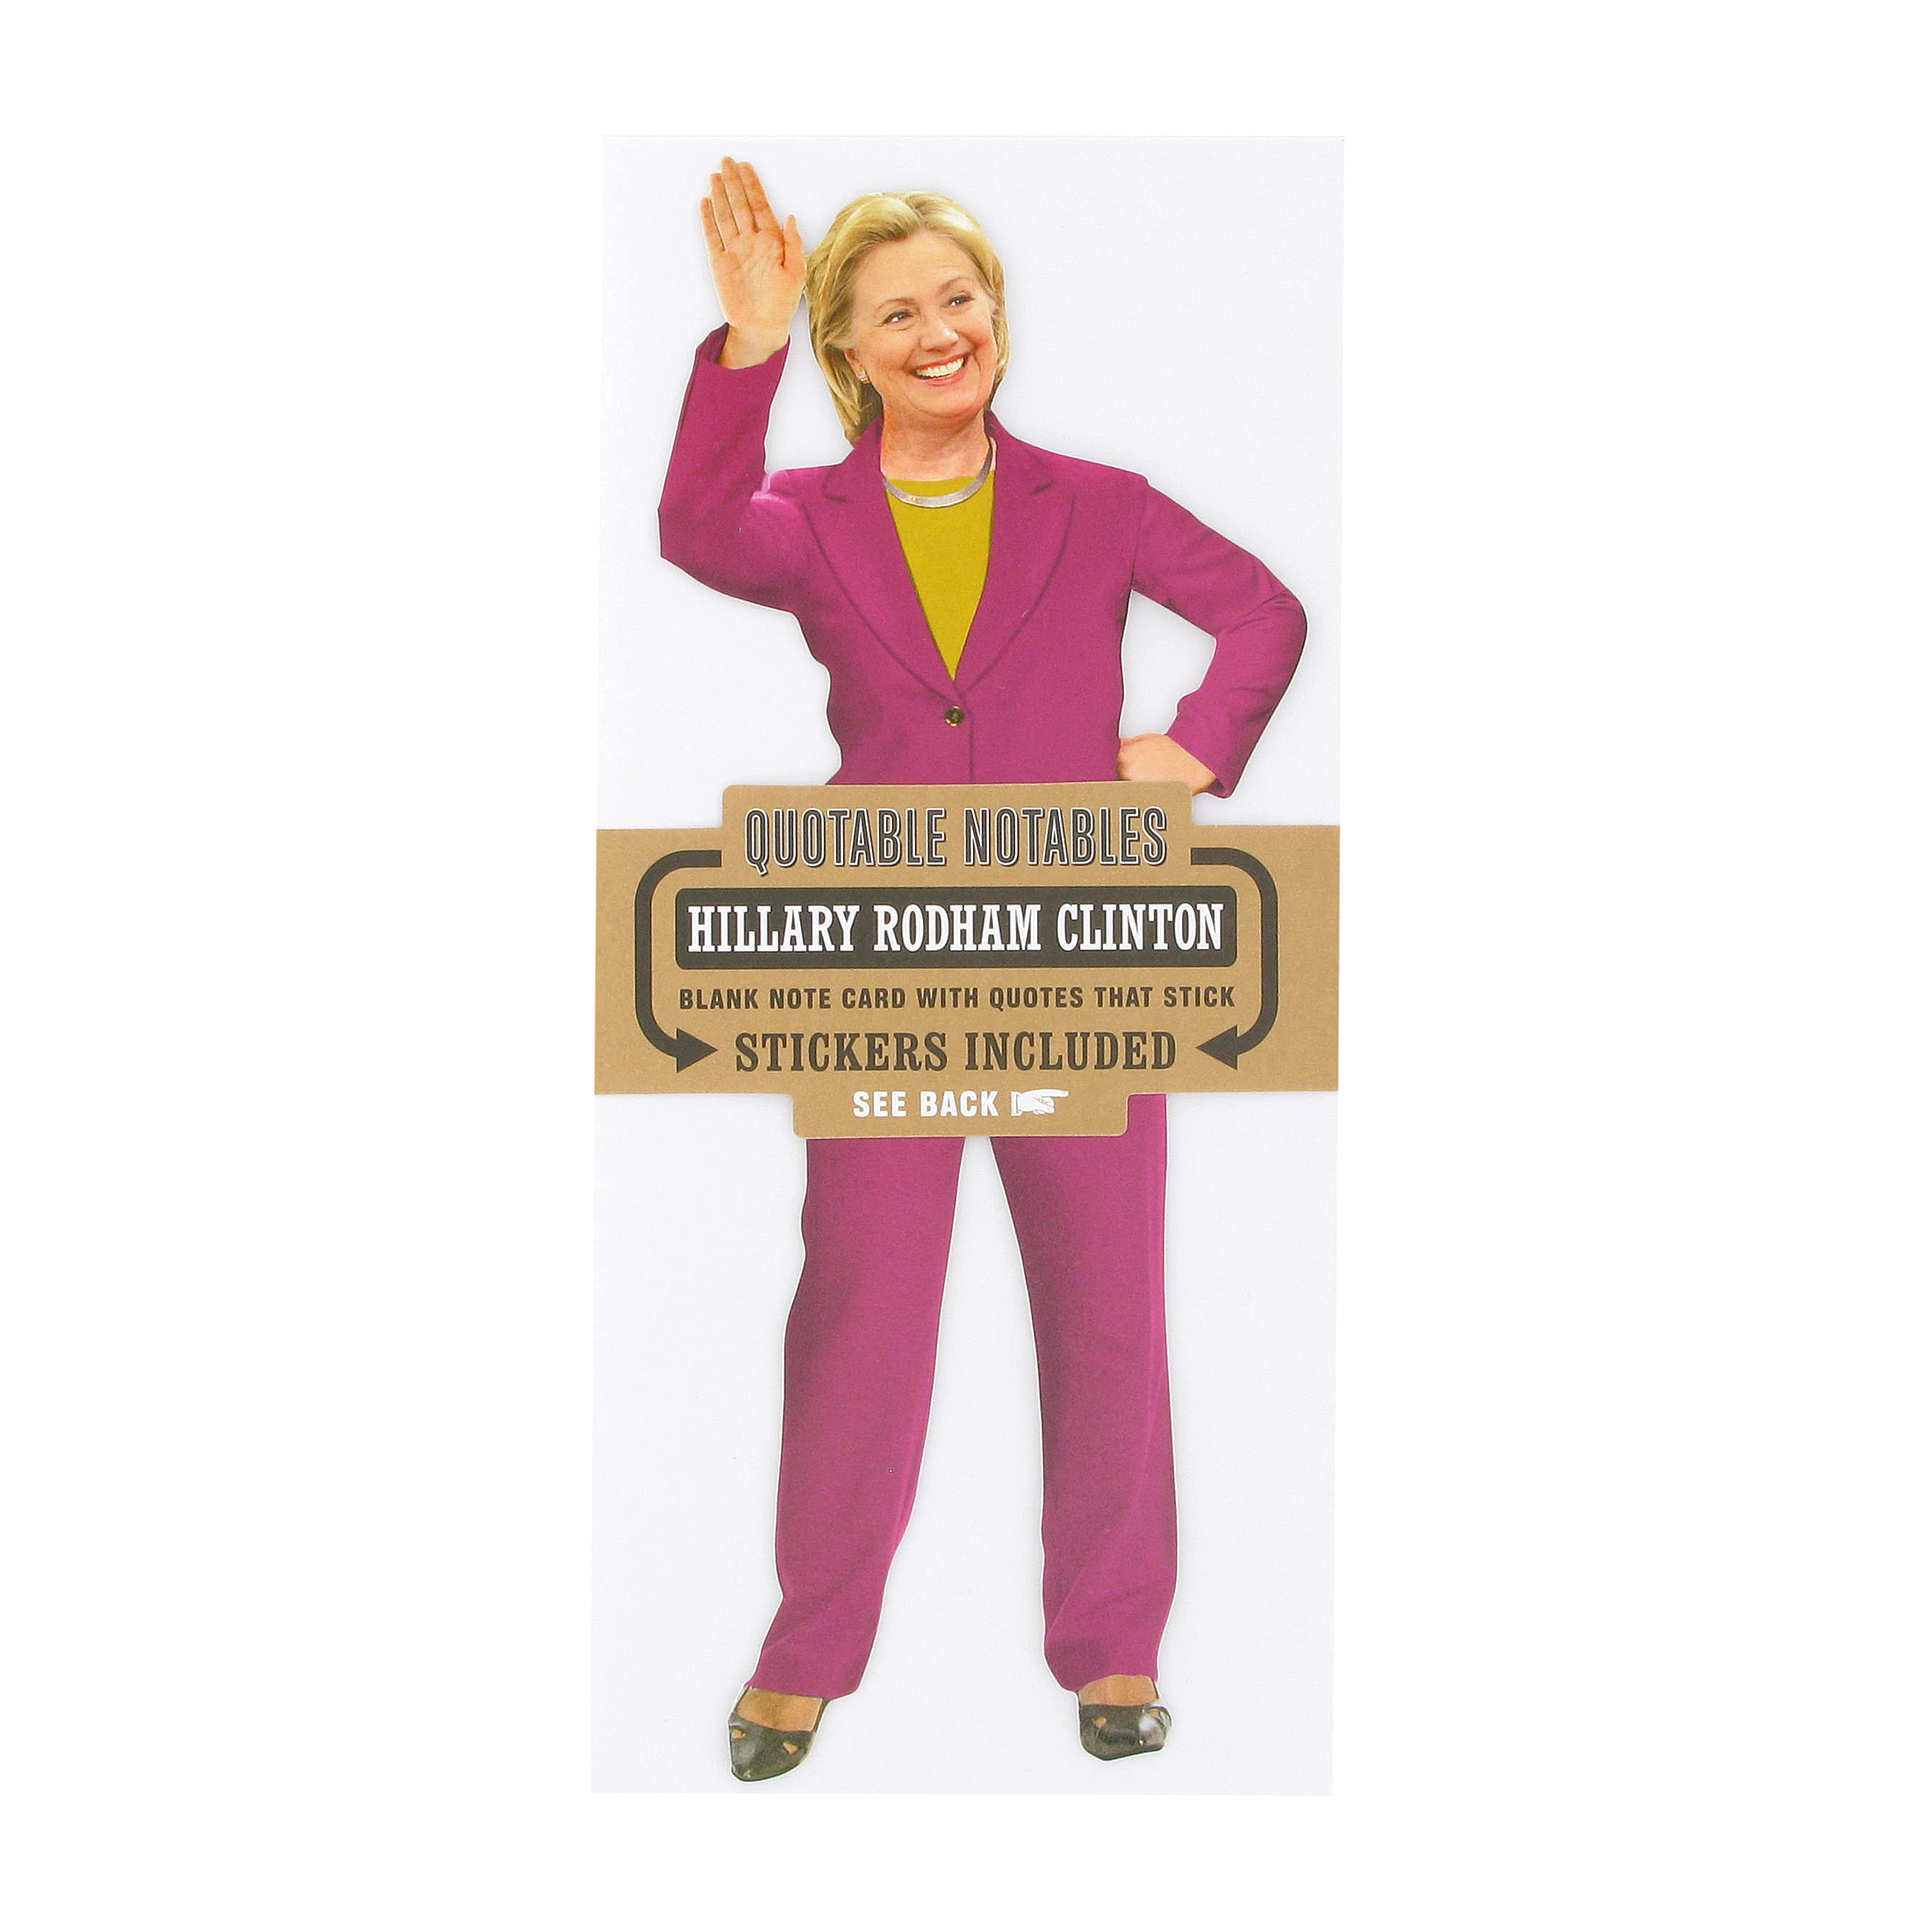 Hillary Clinton quotes card